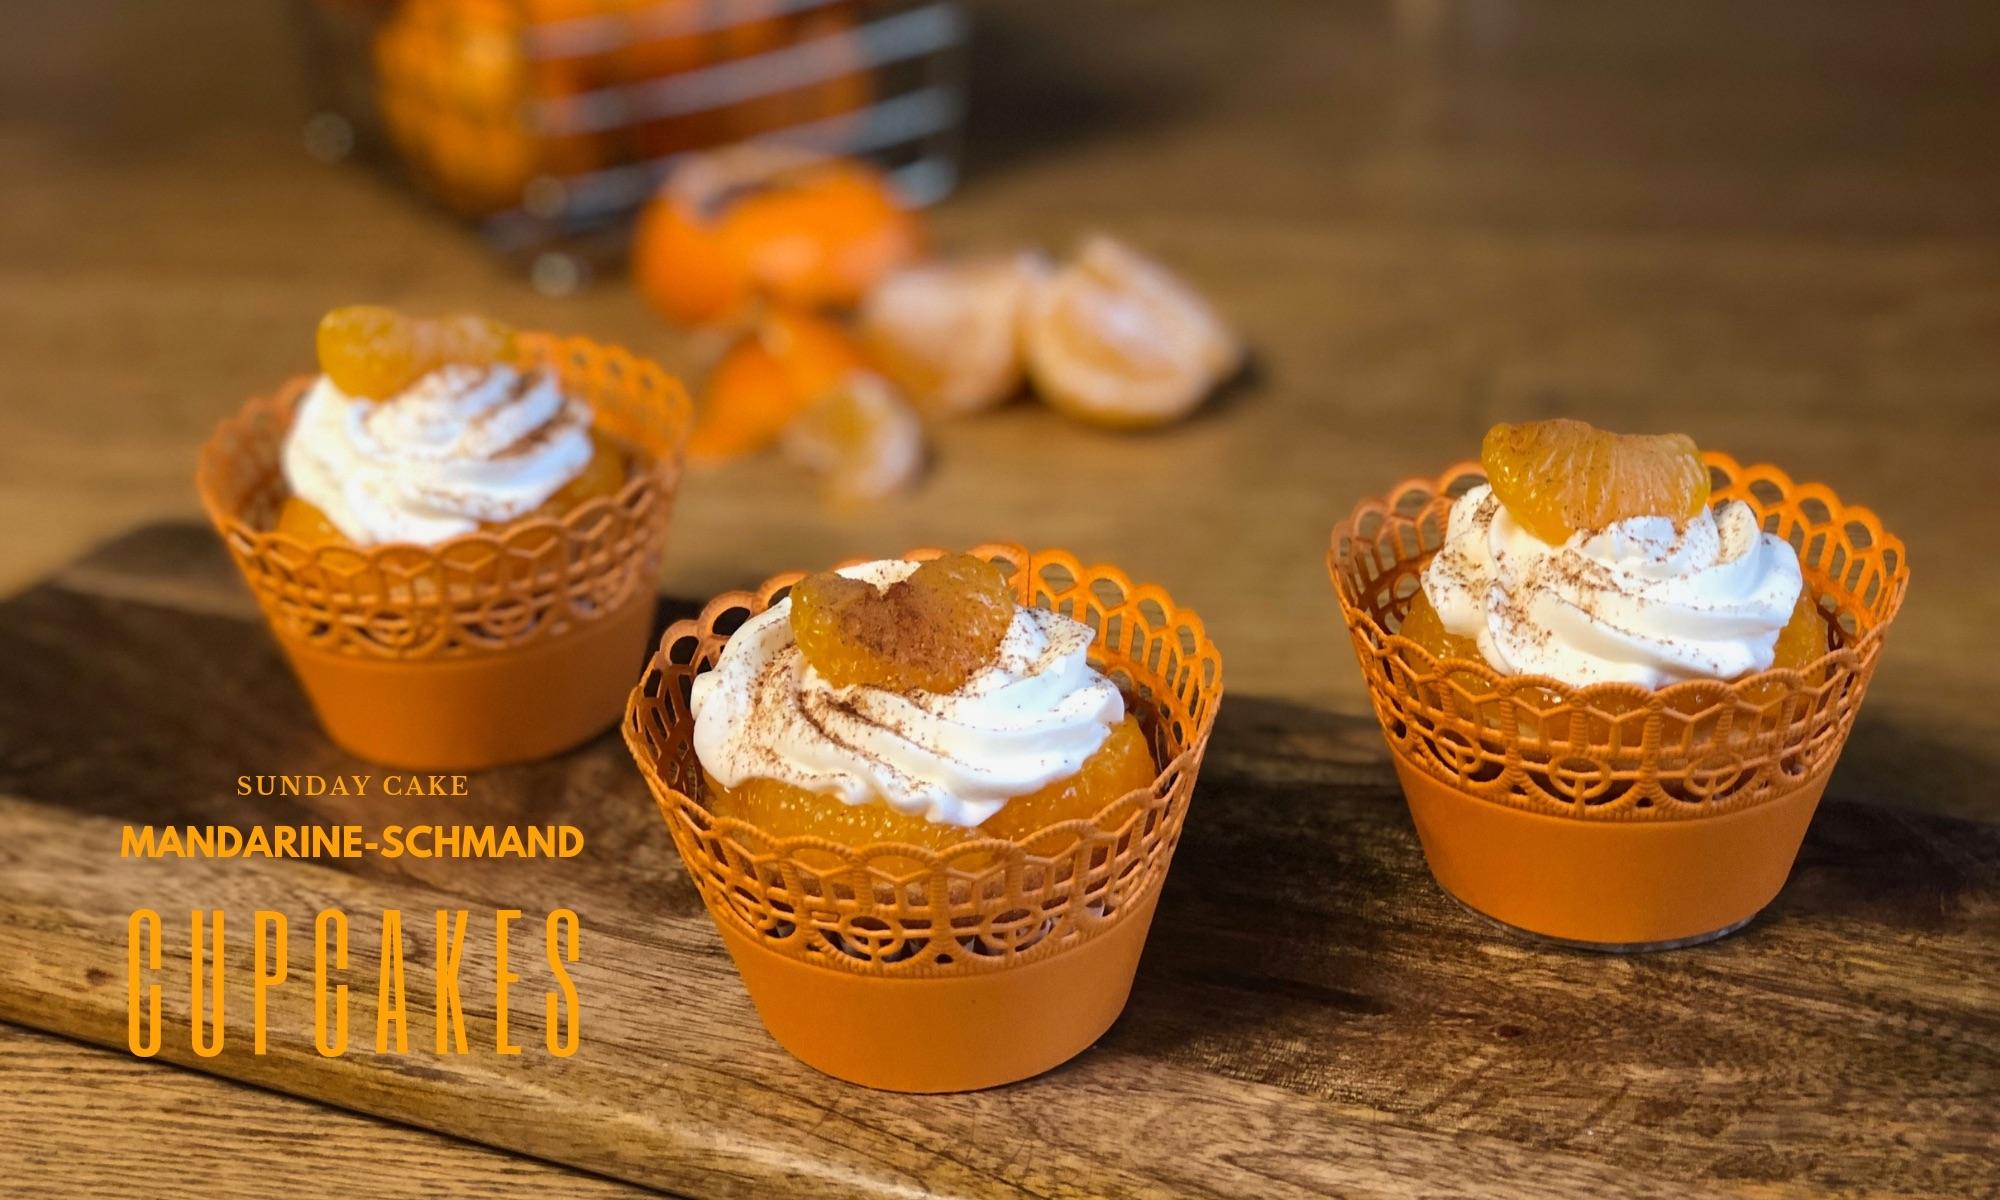 Fruchtig Frische Mandarine Schmand Cupcakes Sunday Cake